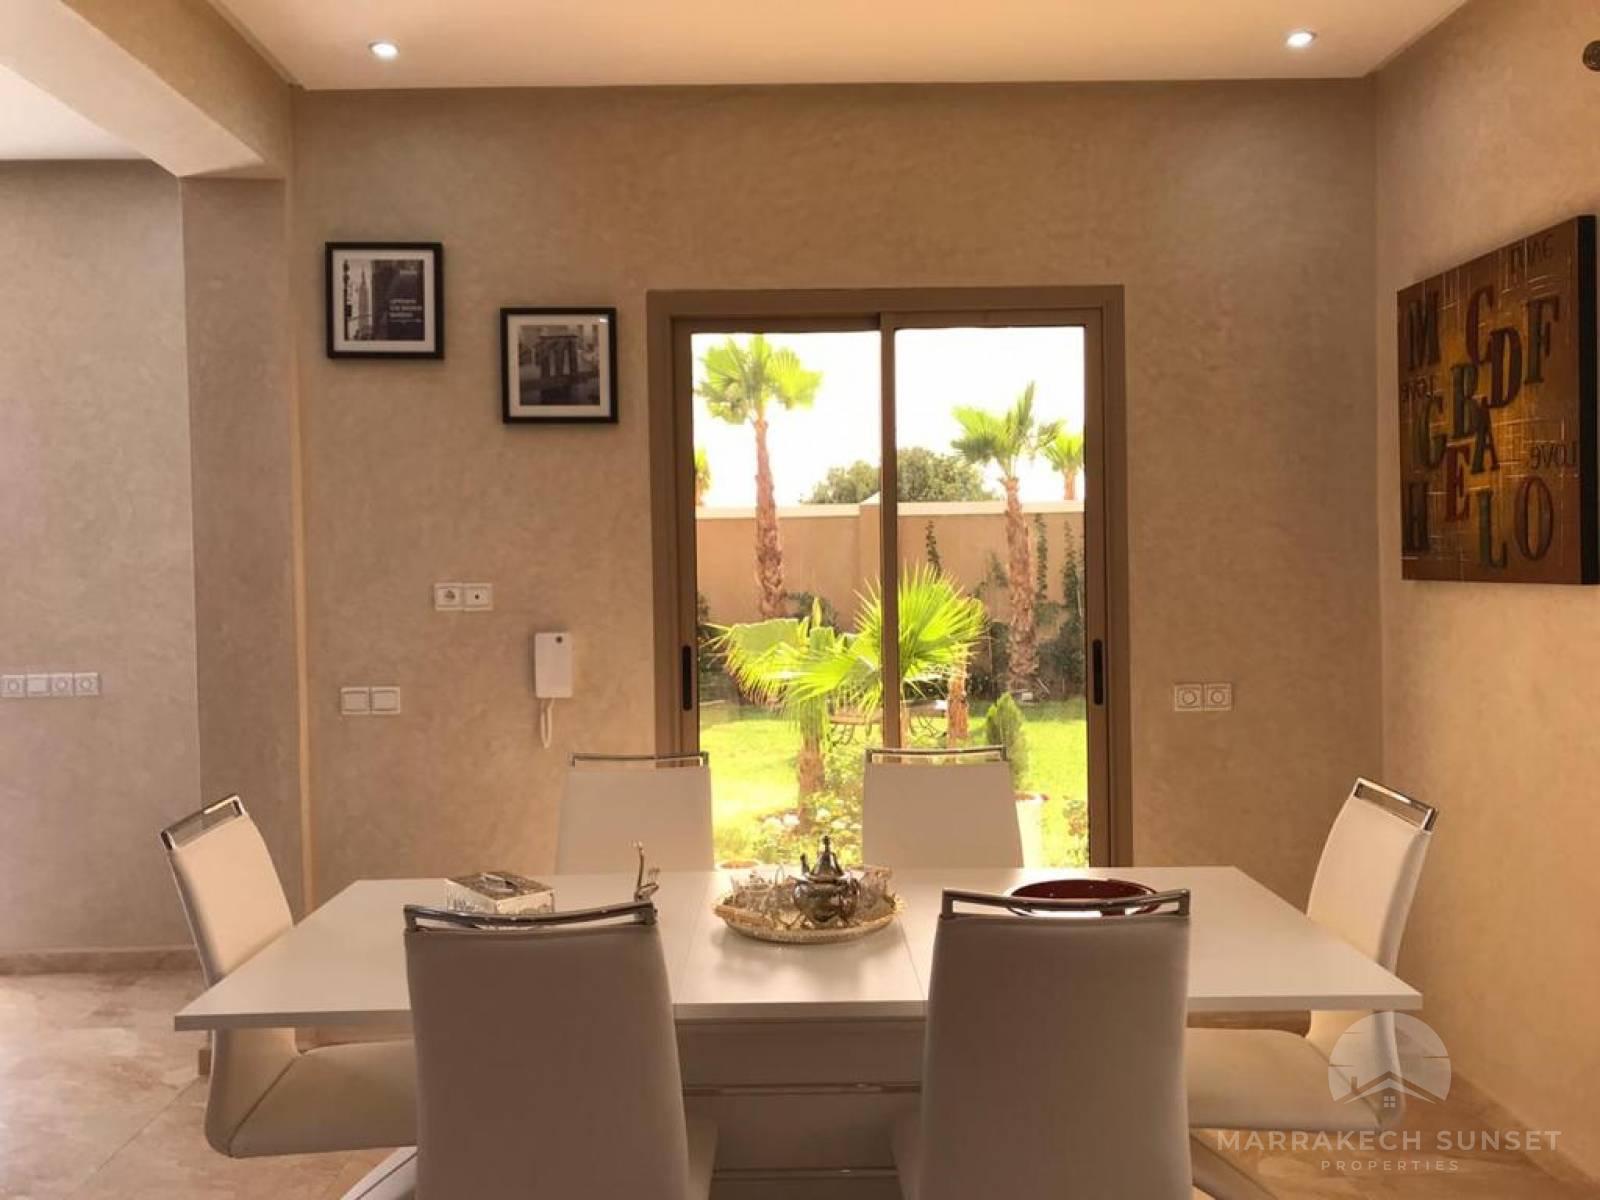 Beautiful villa for sale in Marrakech near Fairmont Royal Palm Golf course